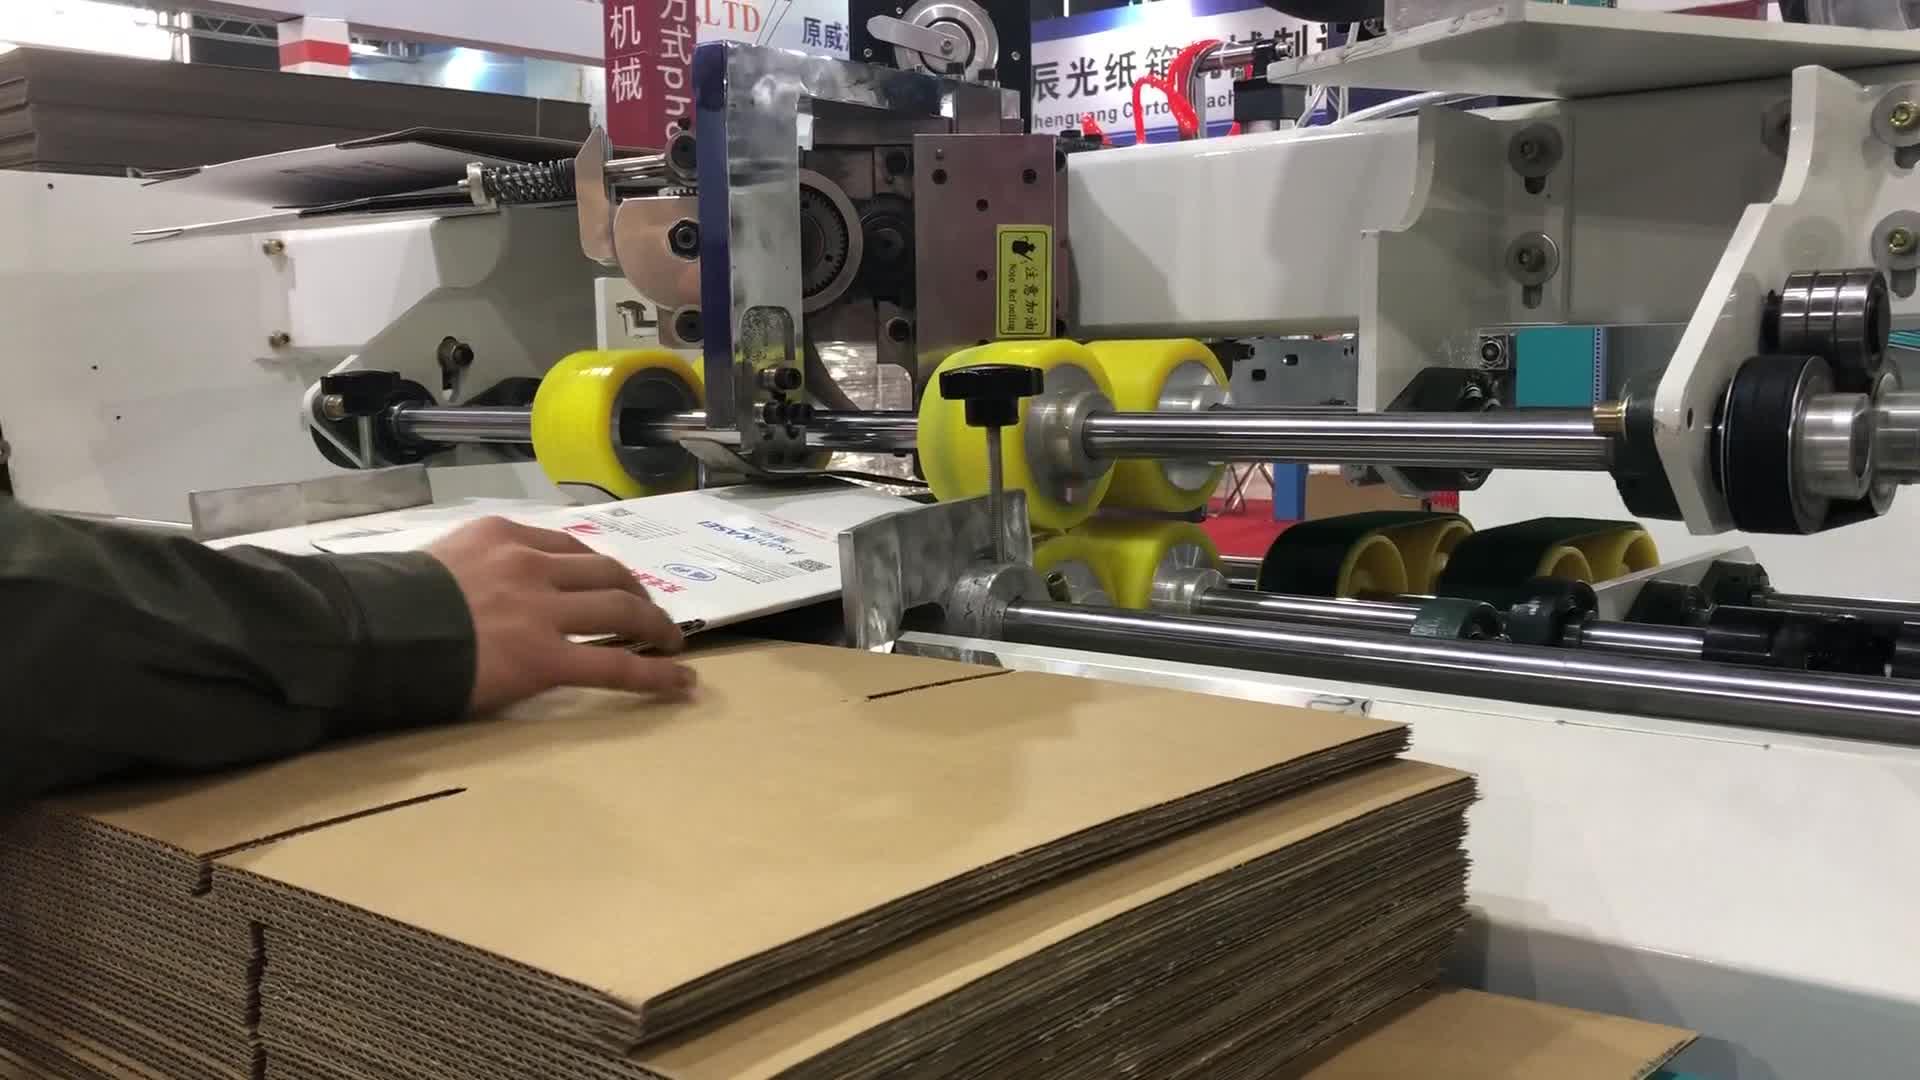 Semi-auto papier box doppel stücke hohe geschwindigkeit karton box nähen maschine